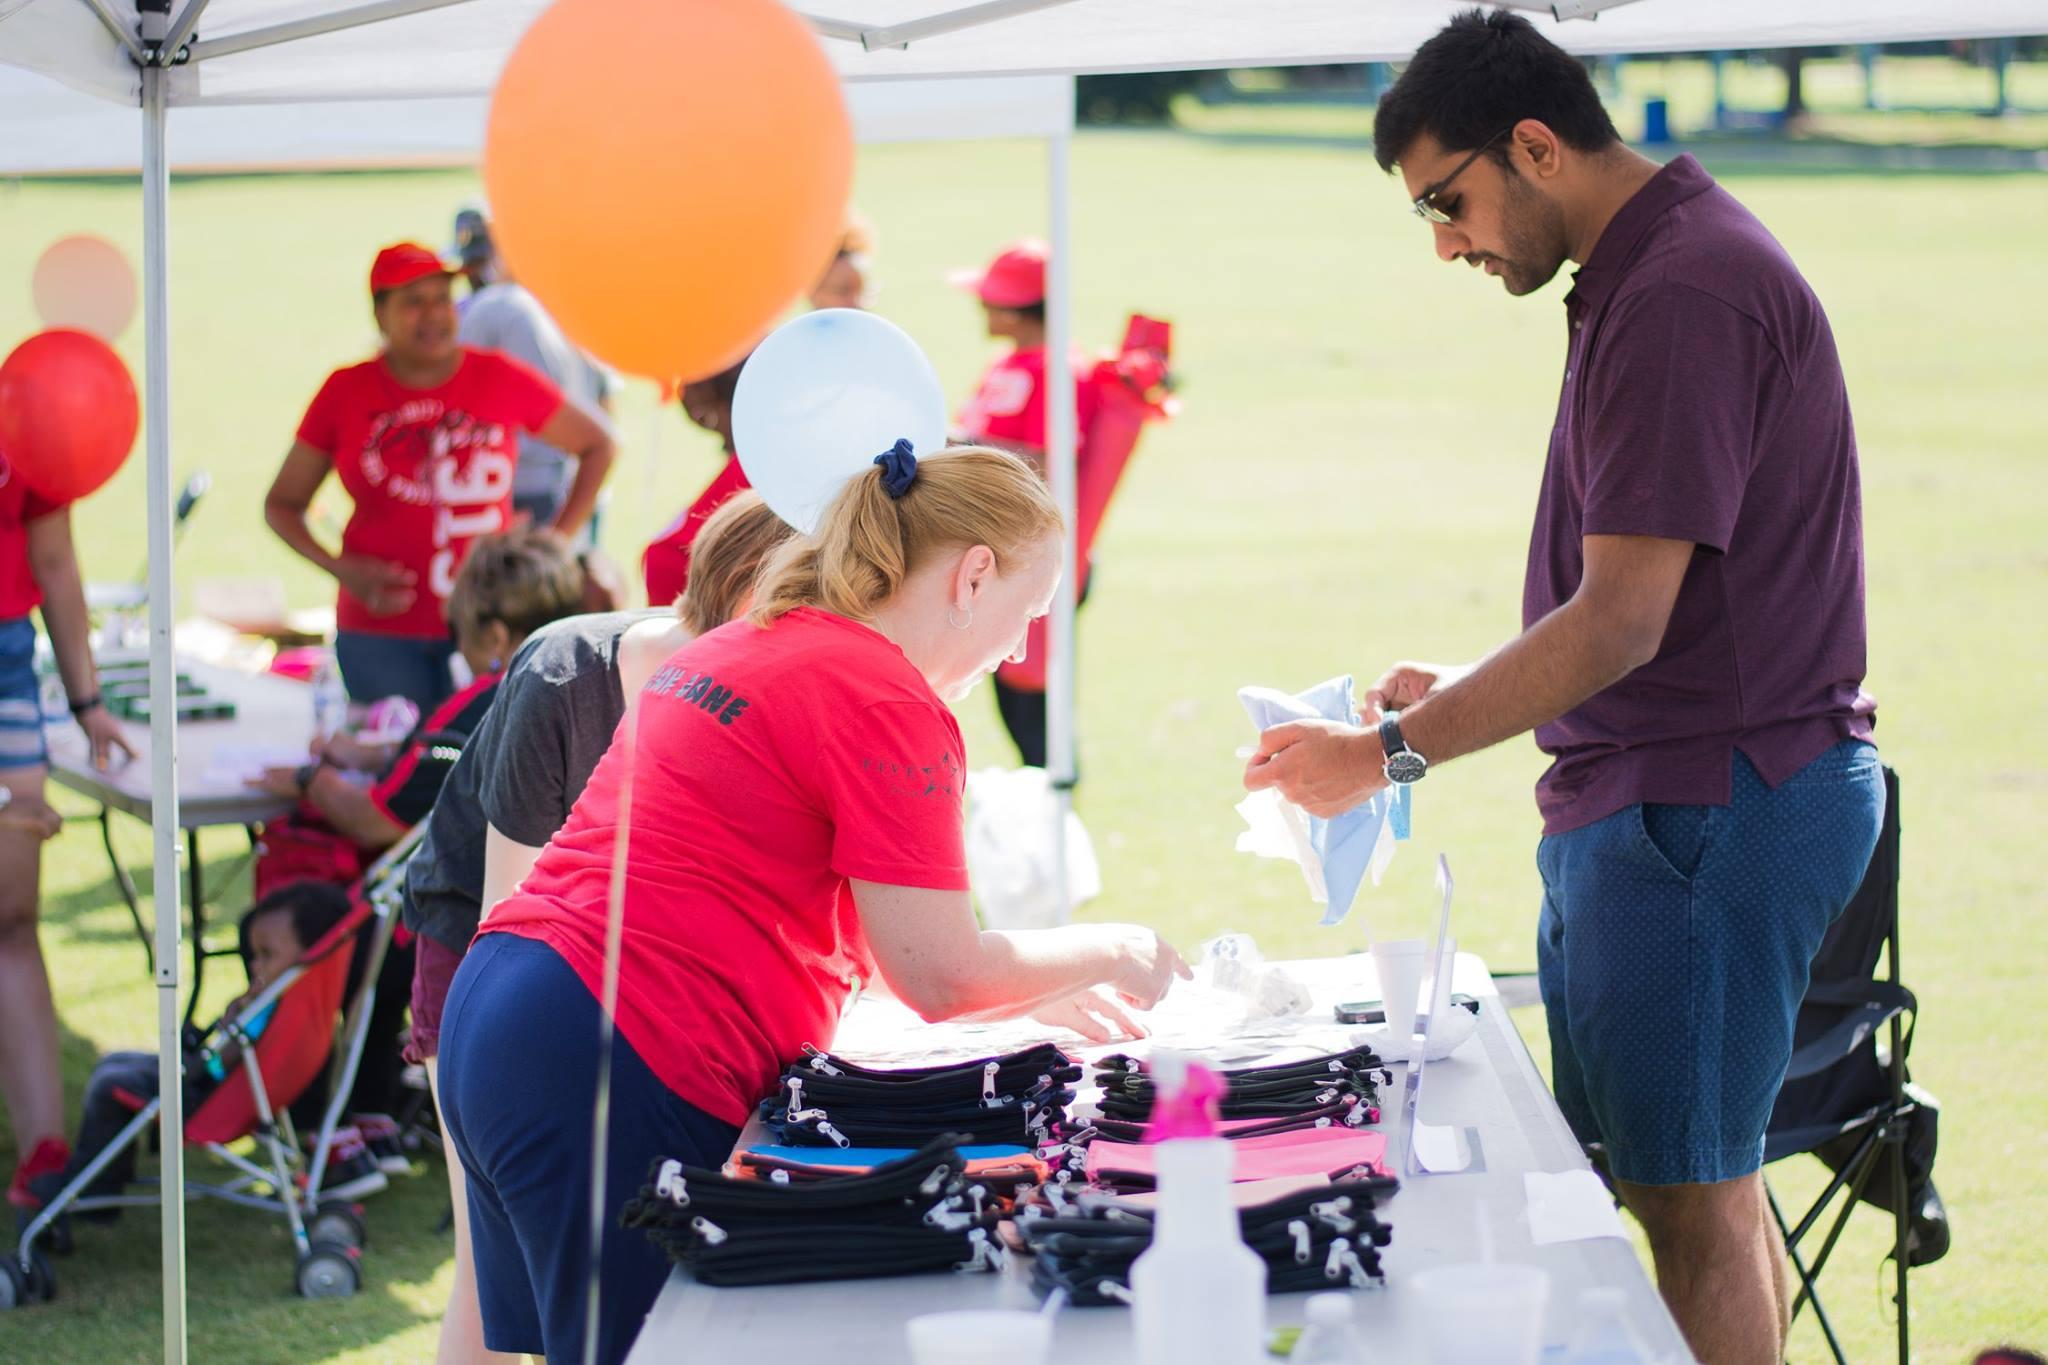 Five Star Food Service Employees volunteering